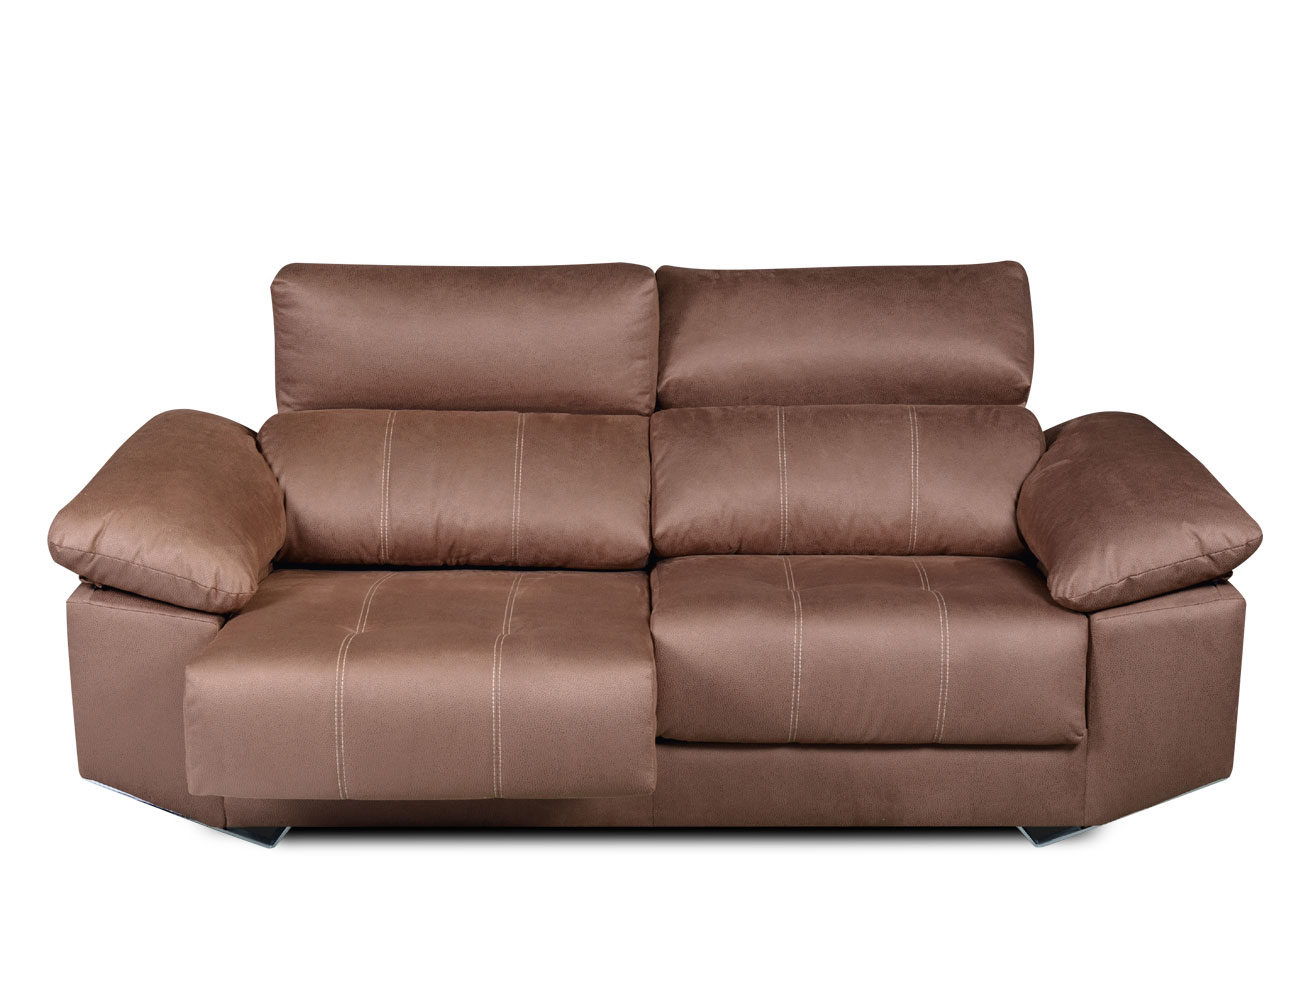 Sofa 3 plazas moderno tejido anti manchas 2